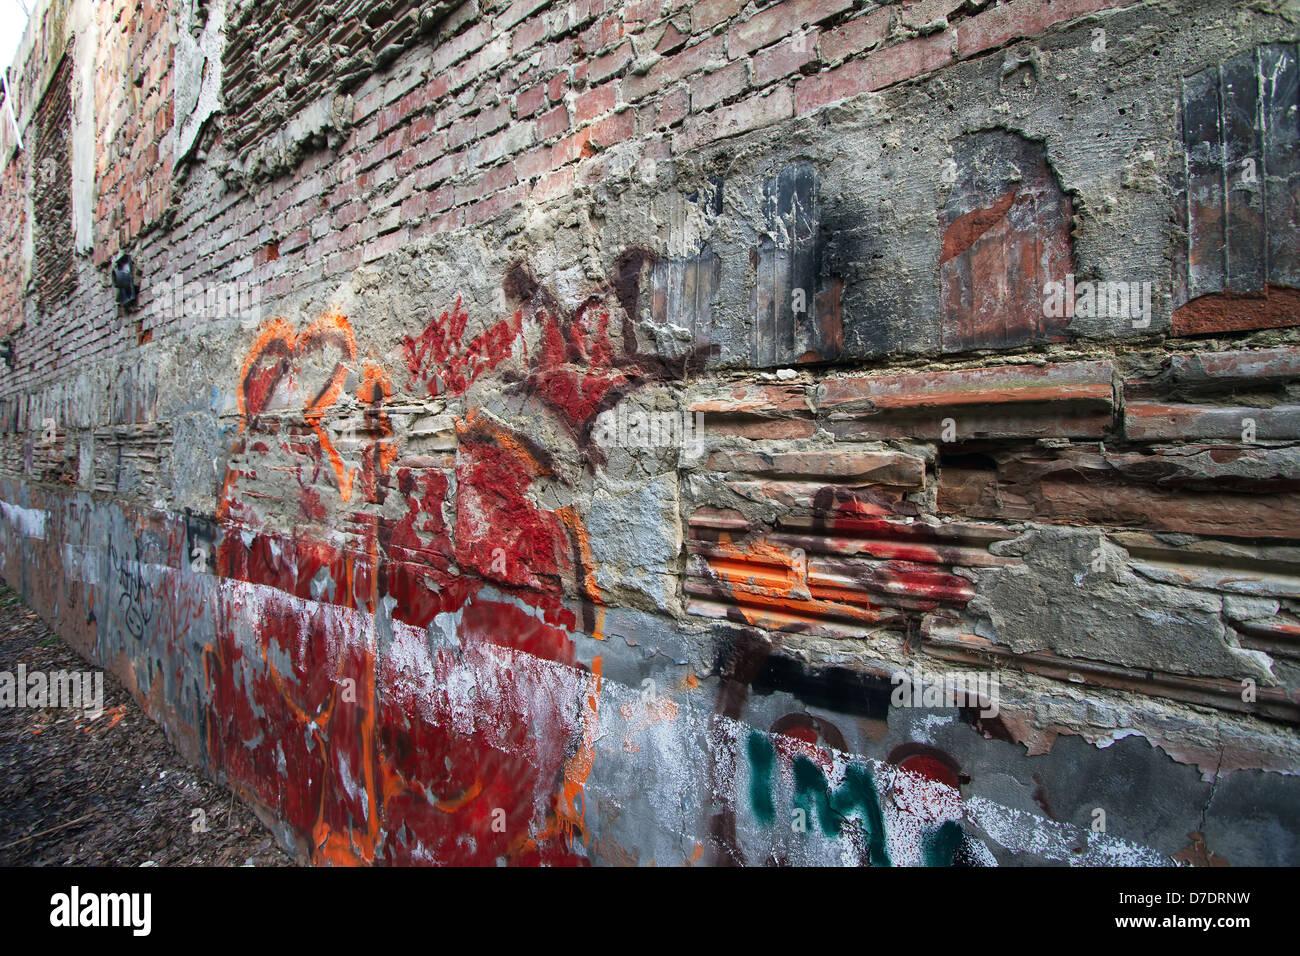 Coole Graffiti Wand In Einem Grunge Stockfoto Bild 56237717 Alamy